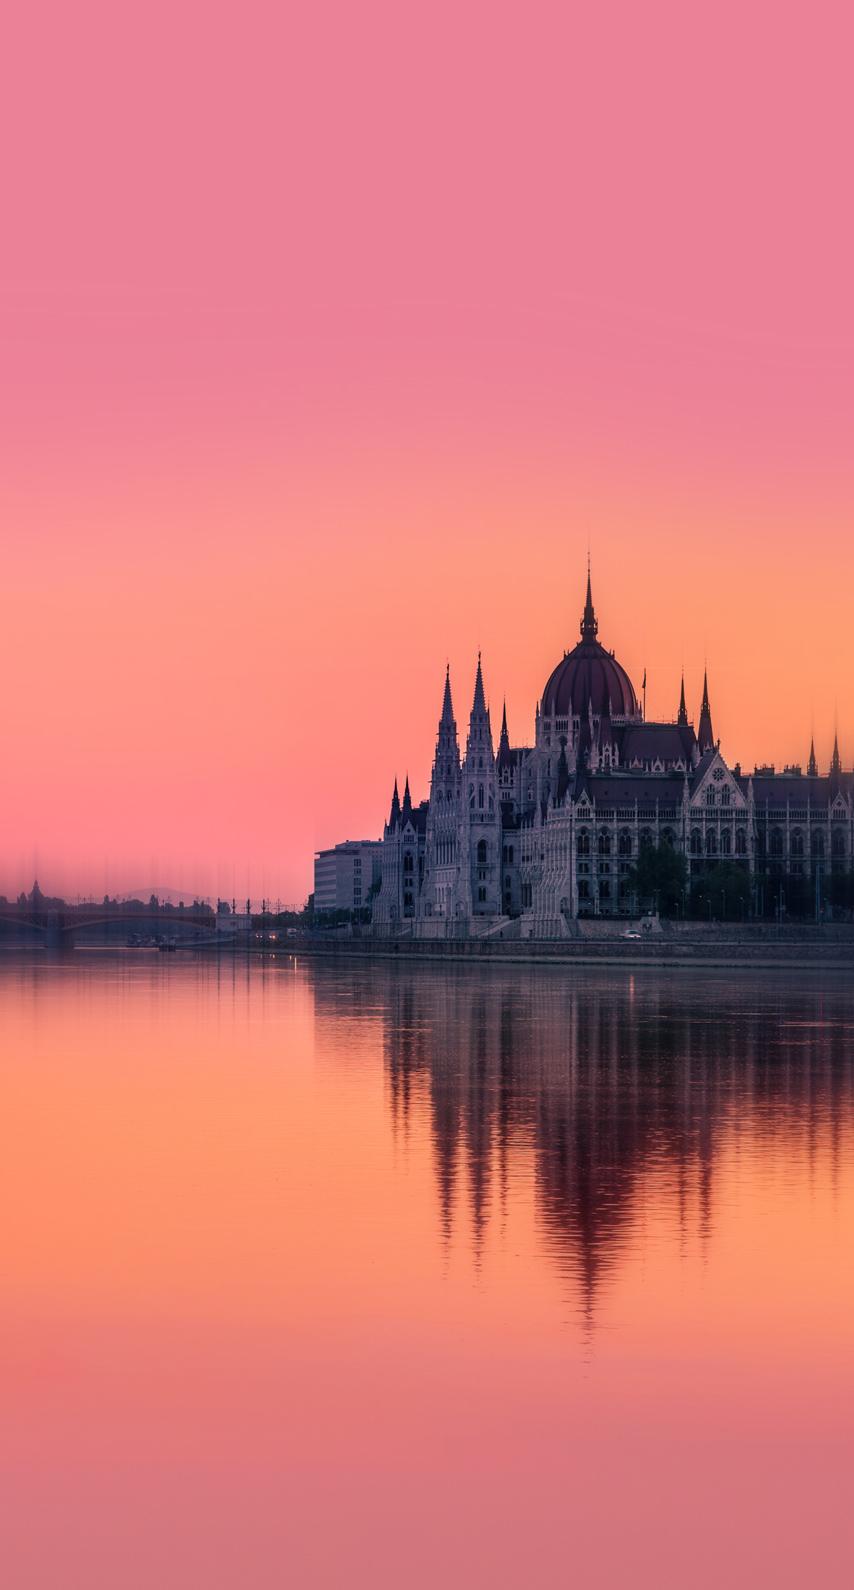 castle, evening